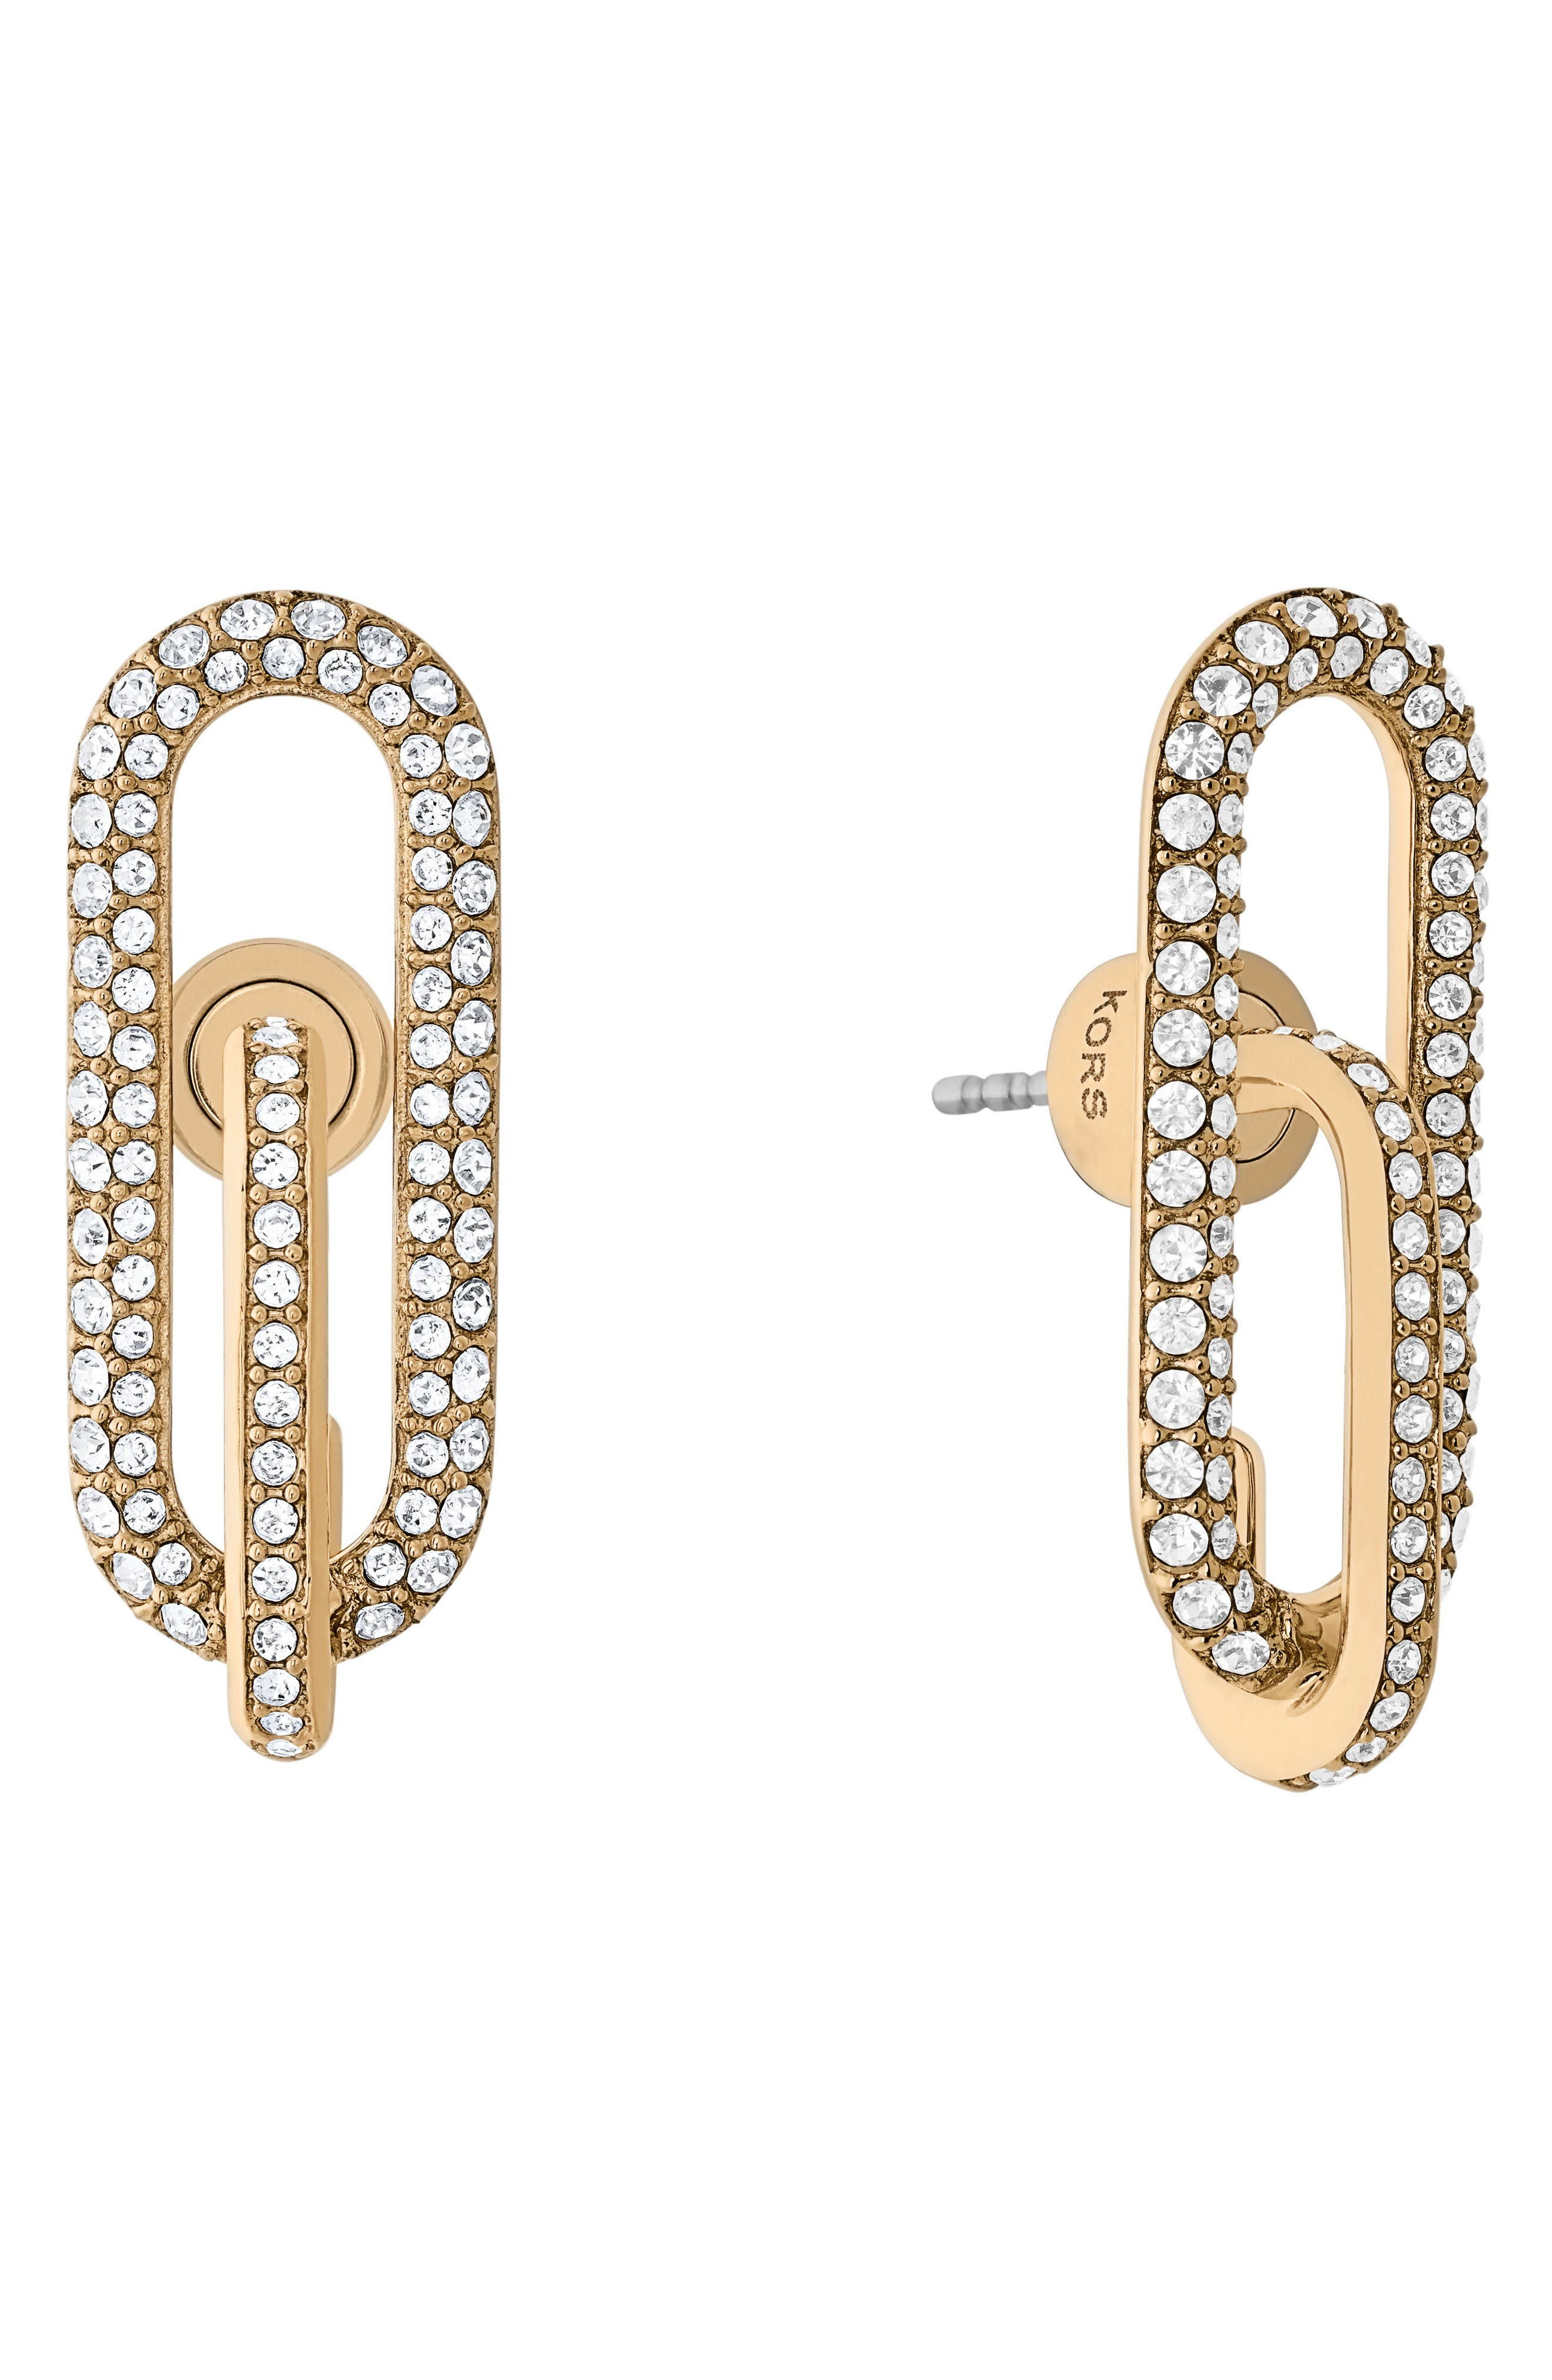 Crystal Stud Earrings,                             Main thumbnail 1, color,                             710